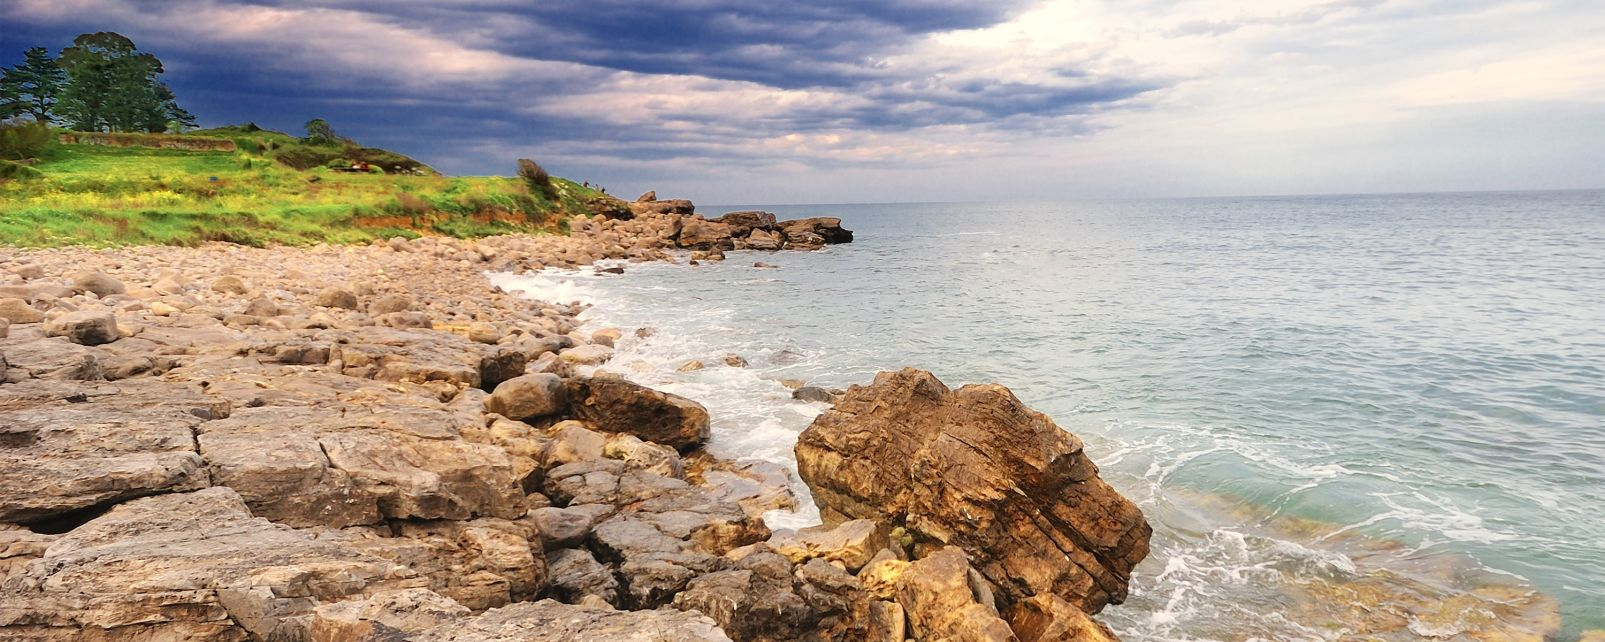 The beaches of Colunga, Coasts, Asturias